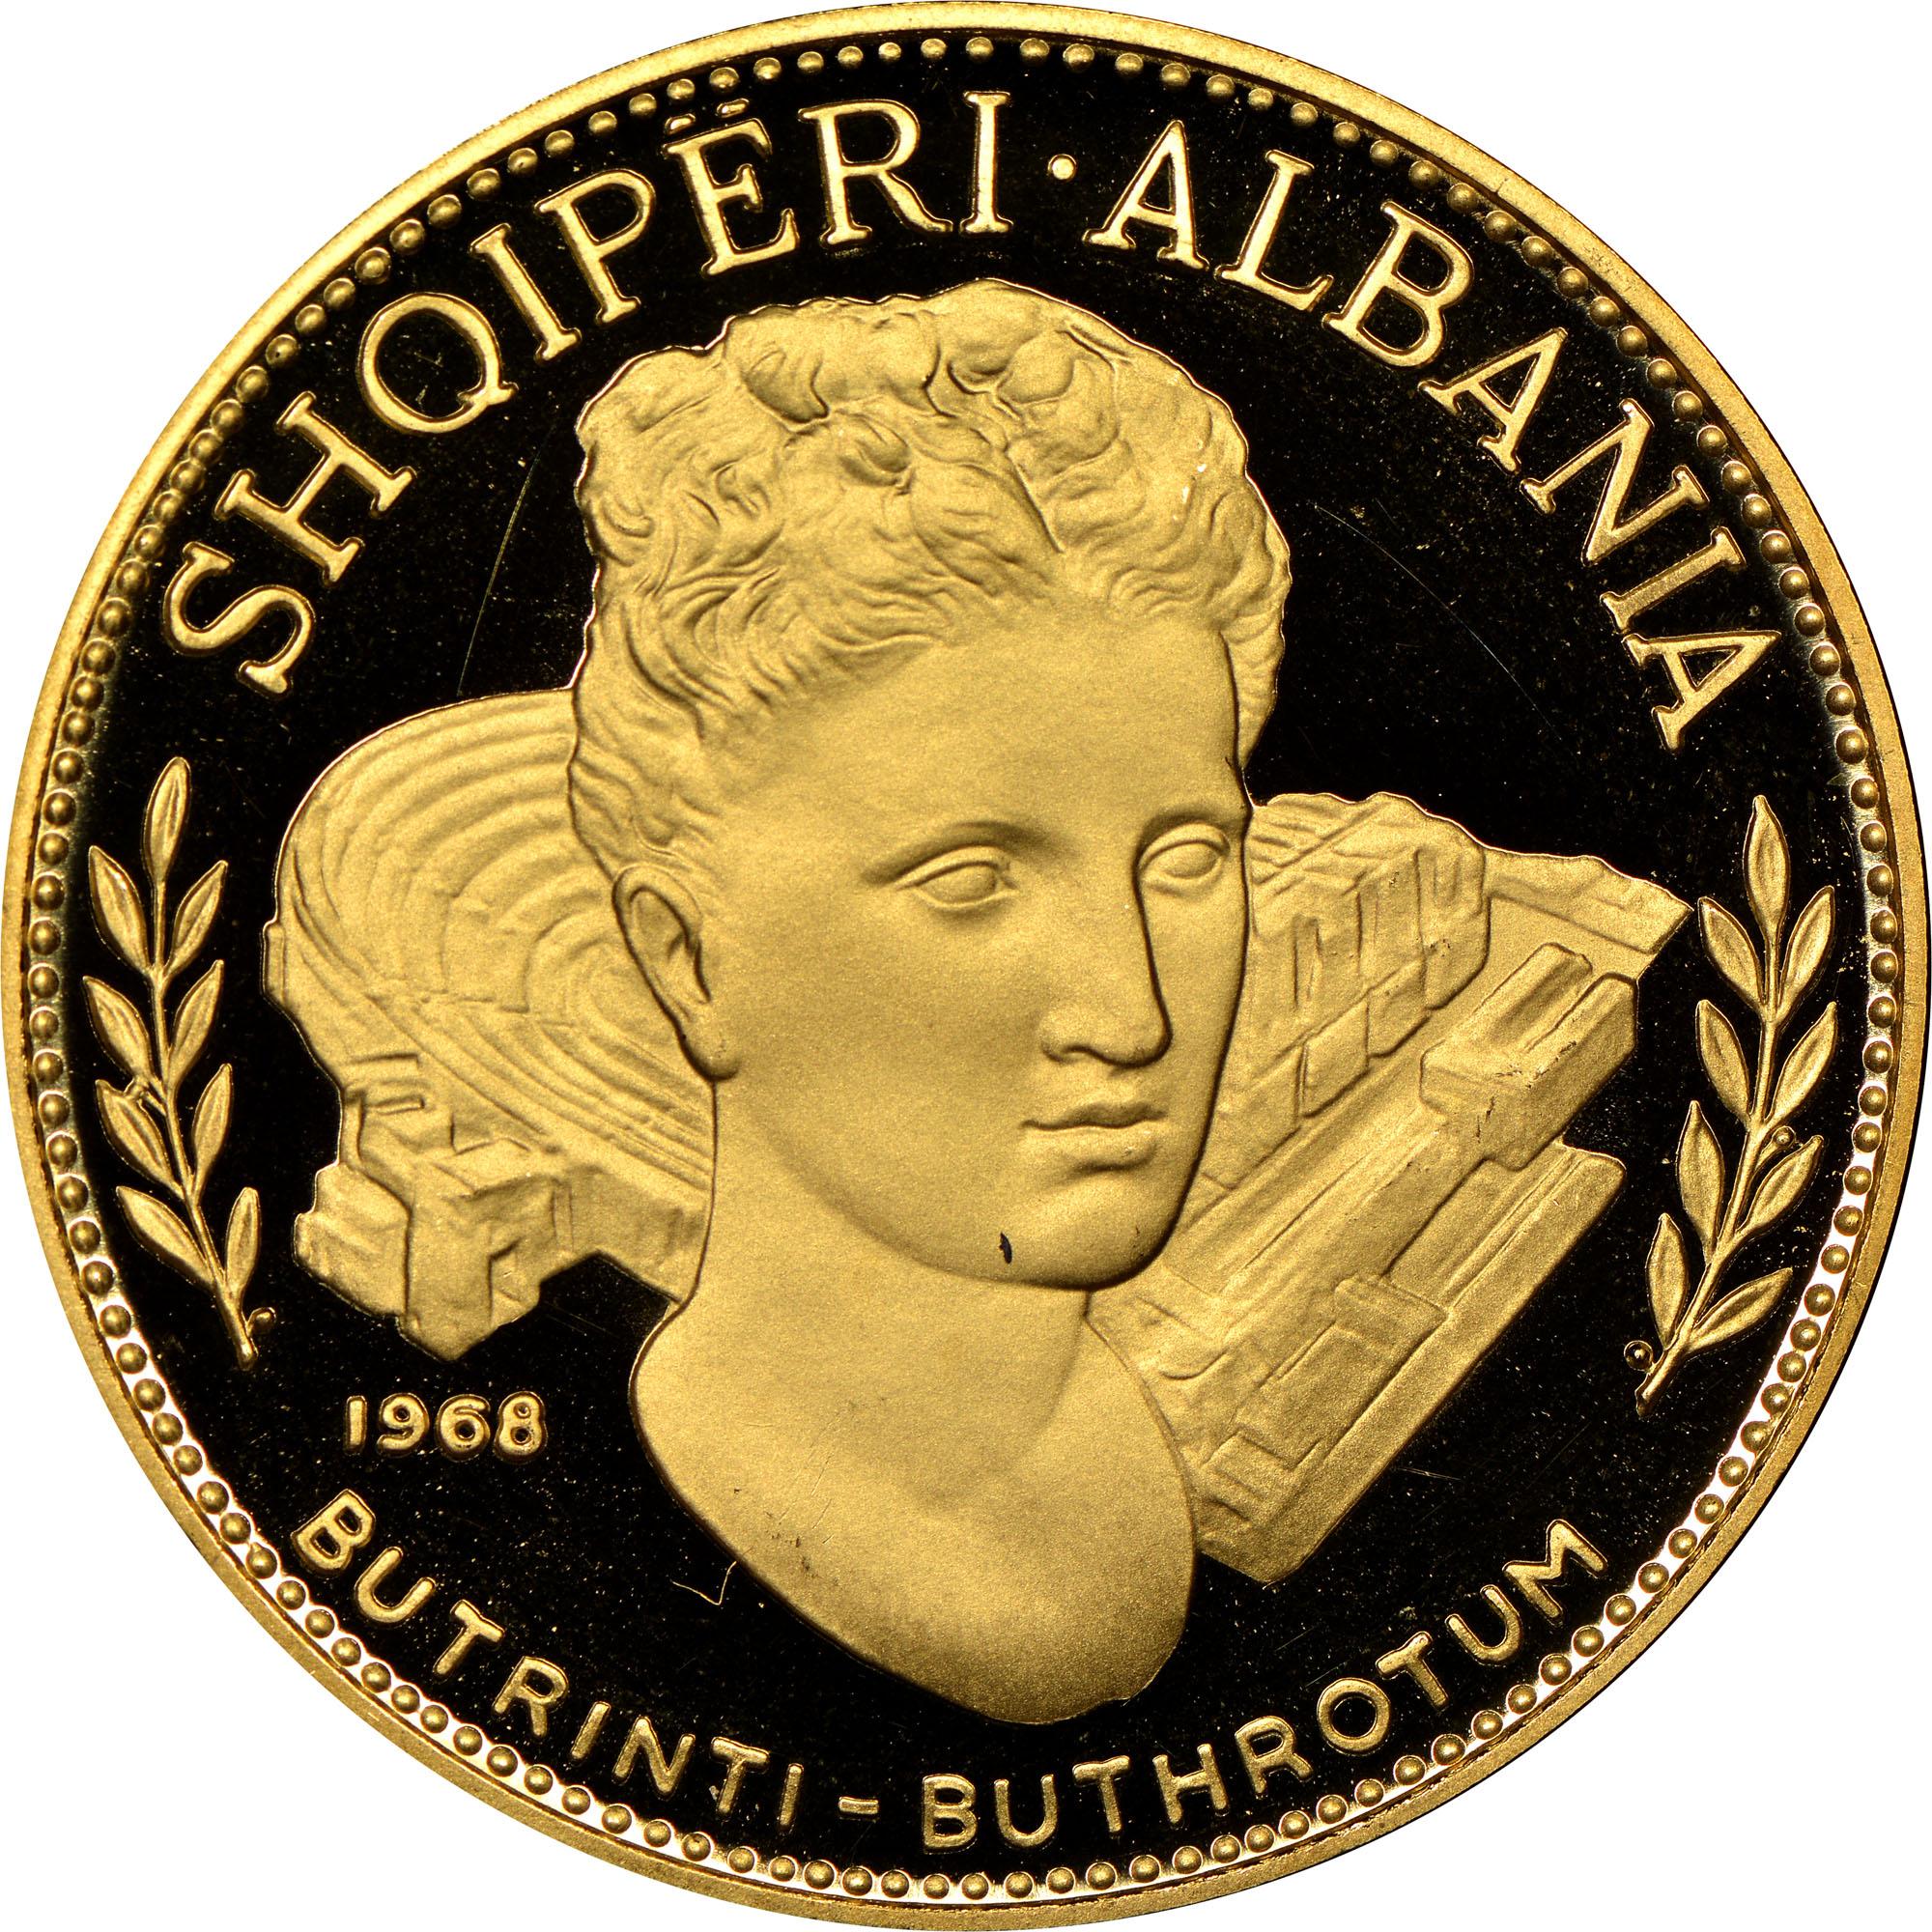 1968 Albania 200 Leke obverse